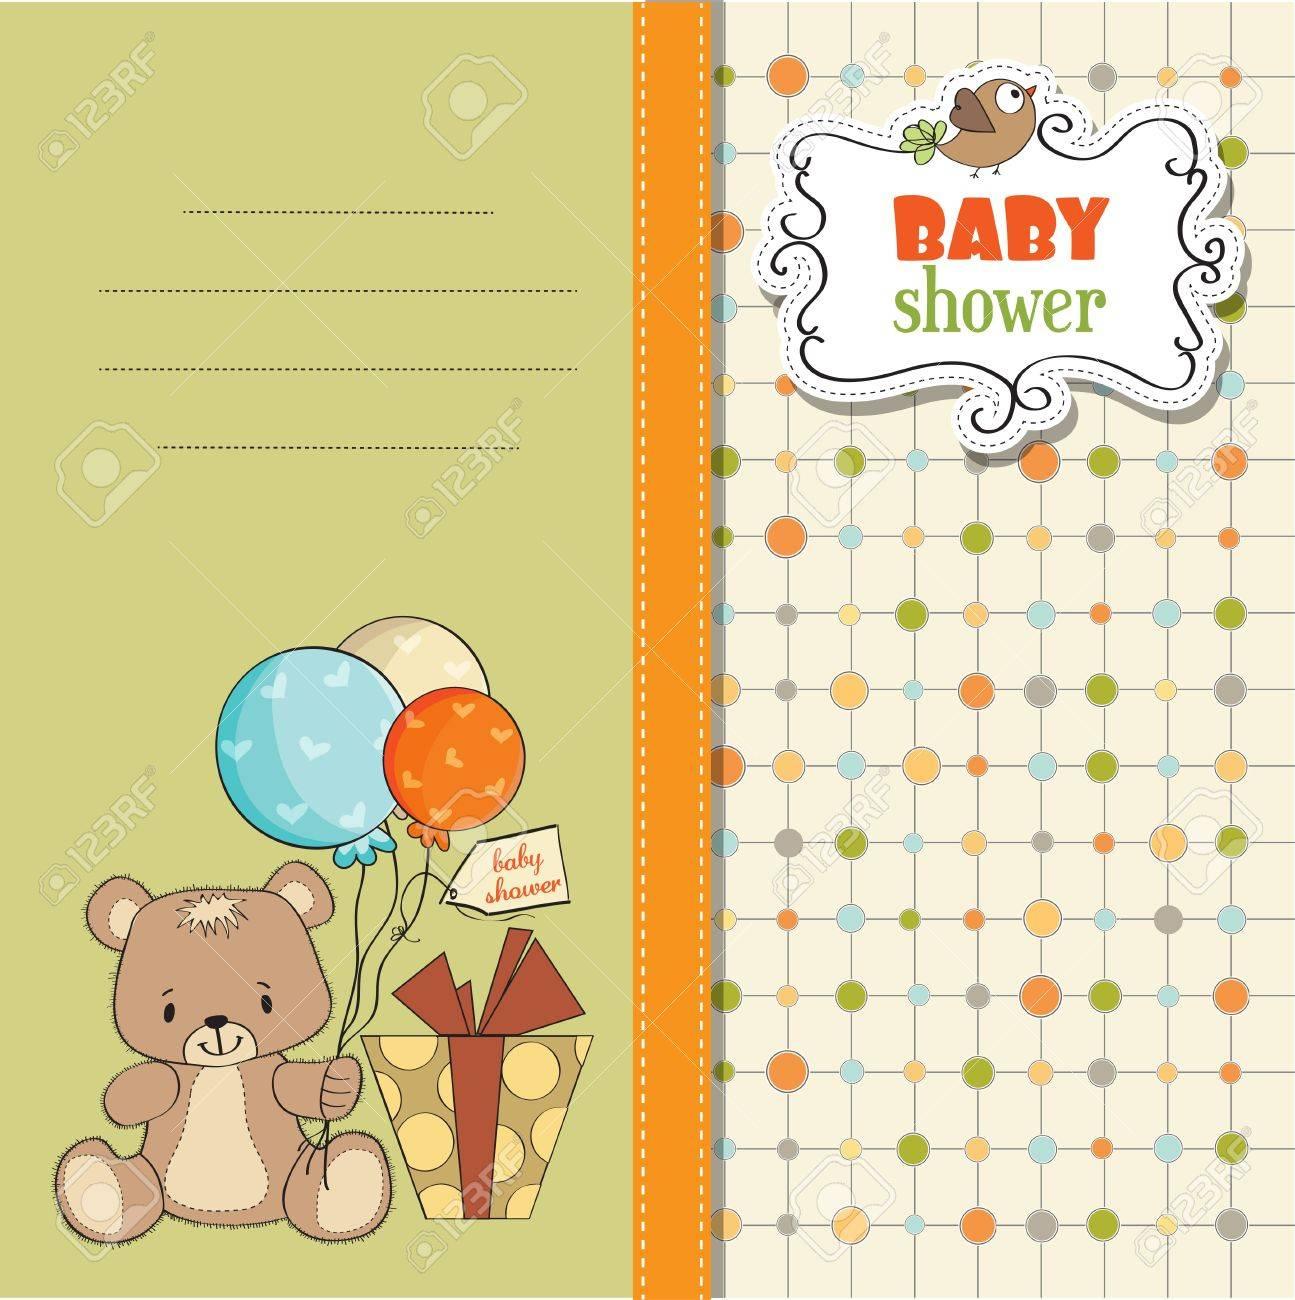 baby shoher card with cute teddy bear Stock Vector - 12897256